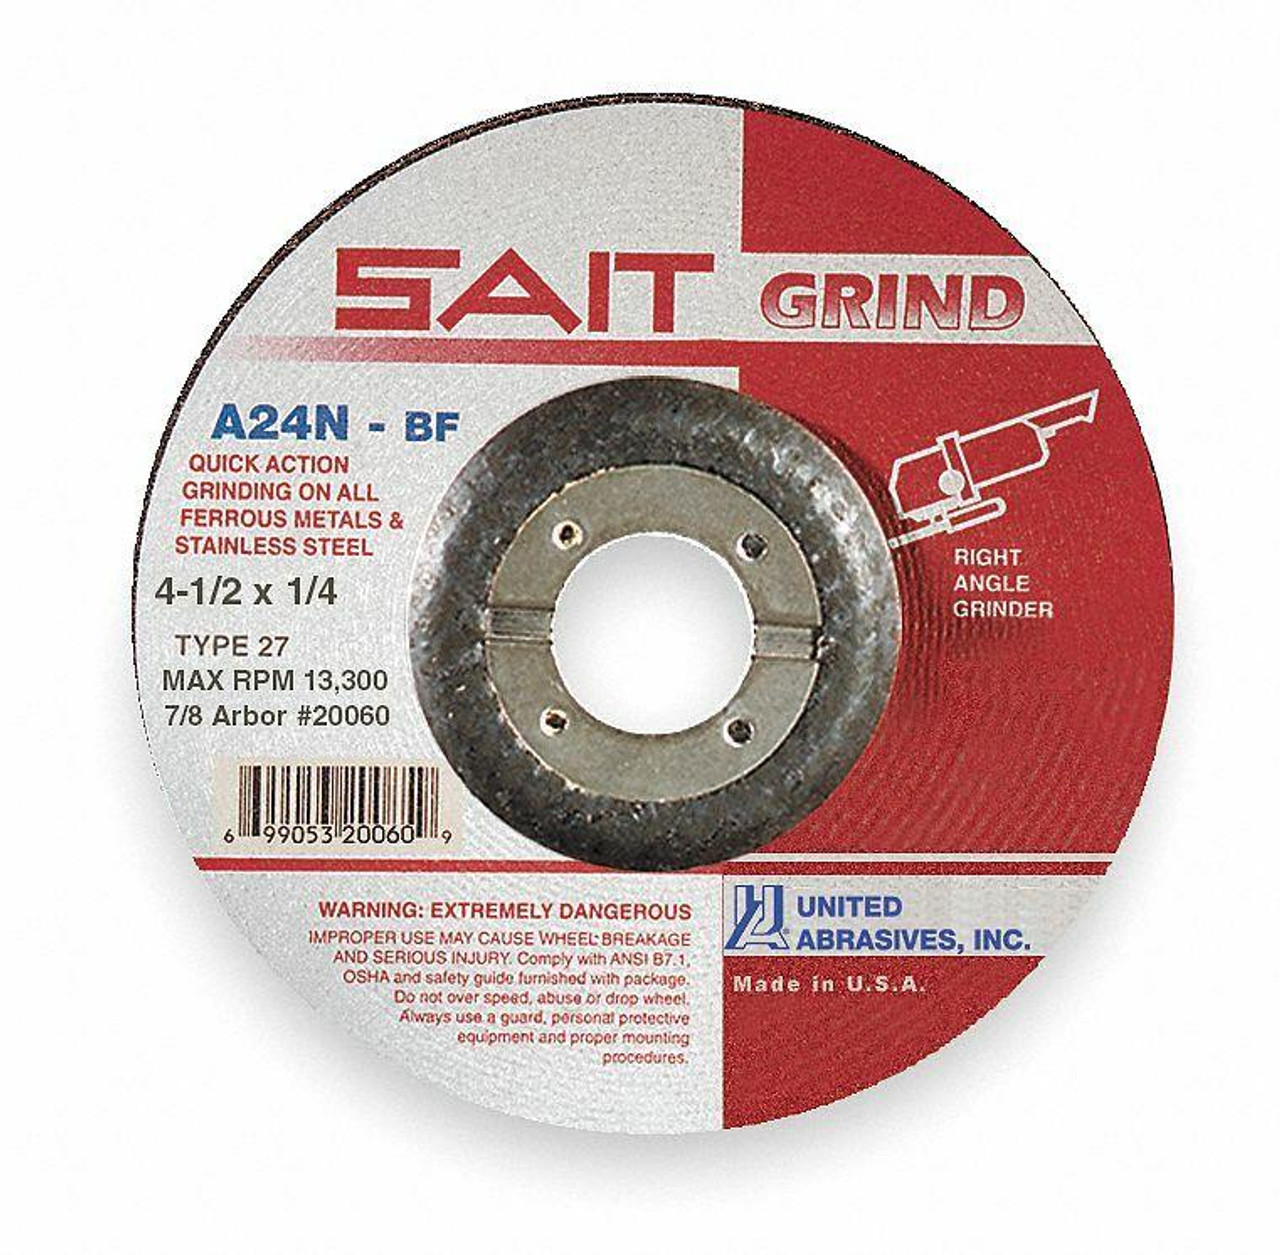 United Abrasives Sait 20060 4.5 x 1/4 x 7/8 Type 27 A24N Depressed Center Grinding Wheel - Box of 25